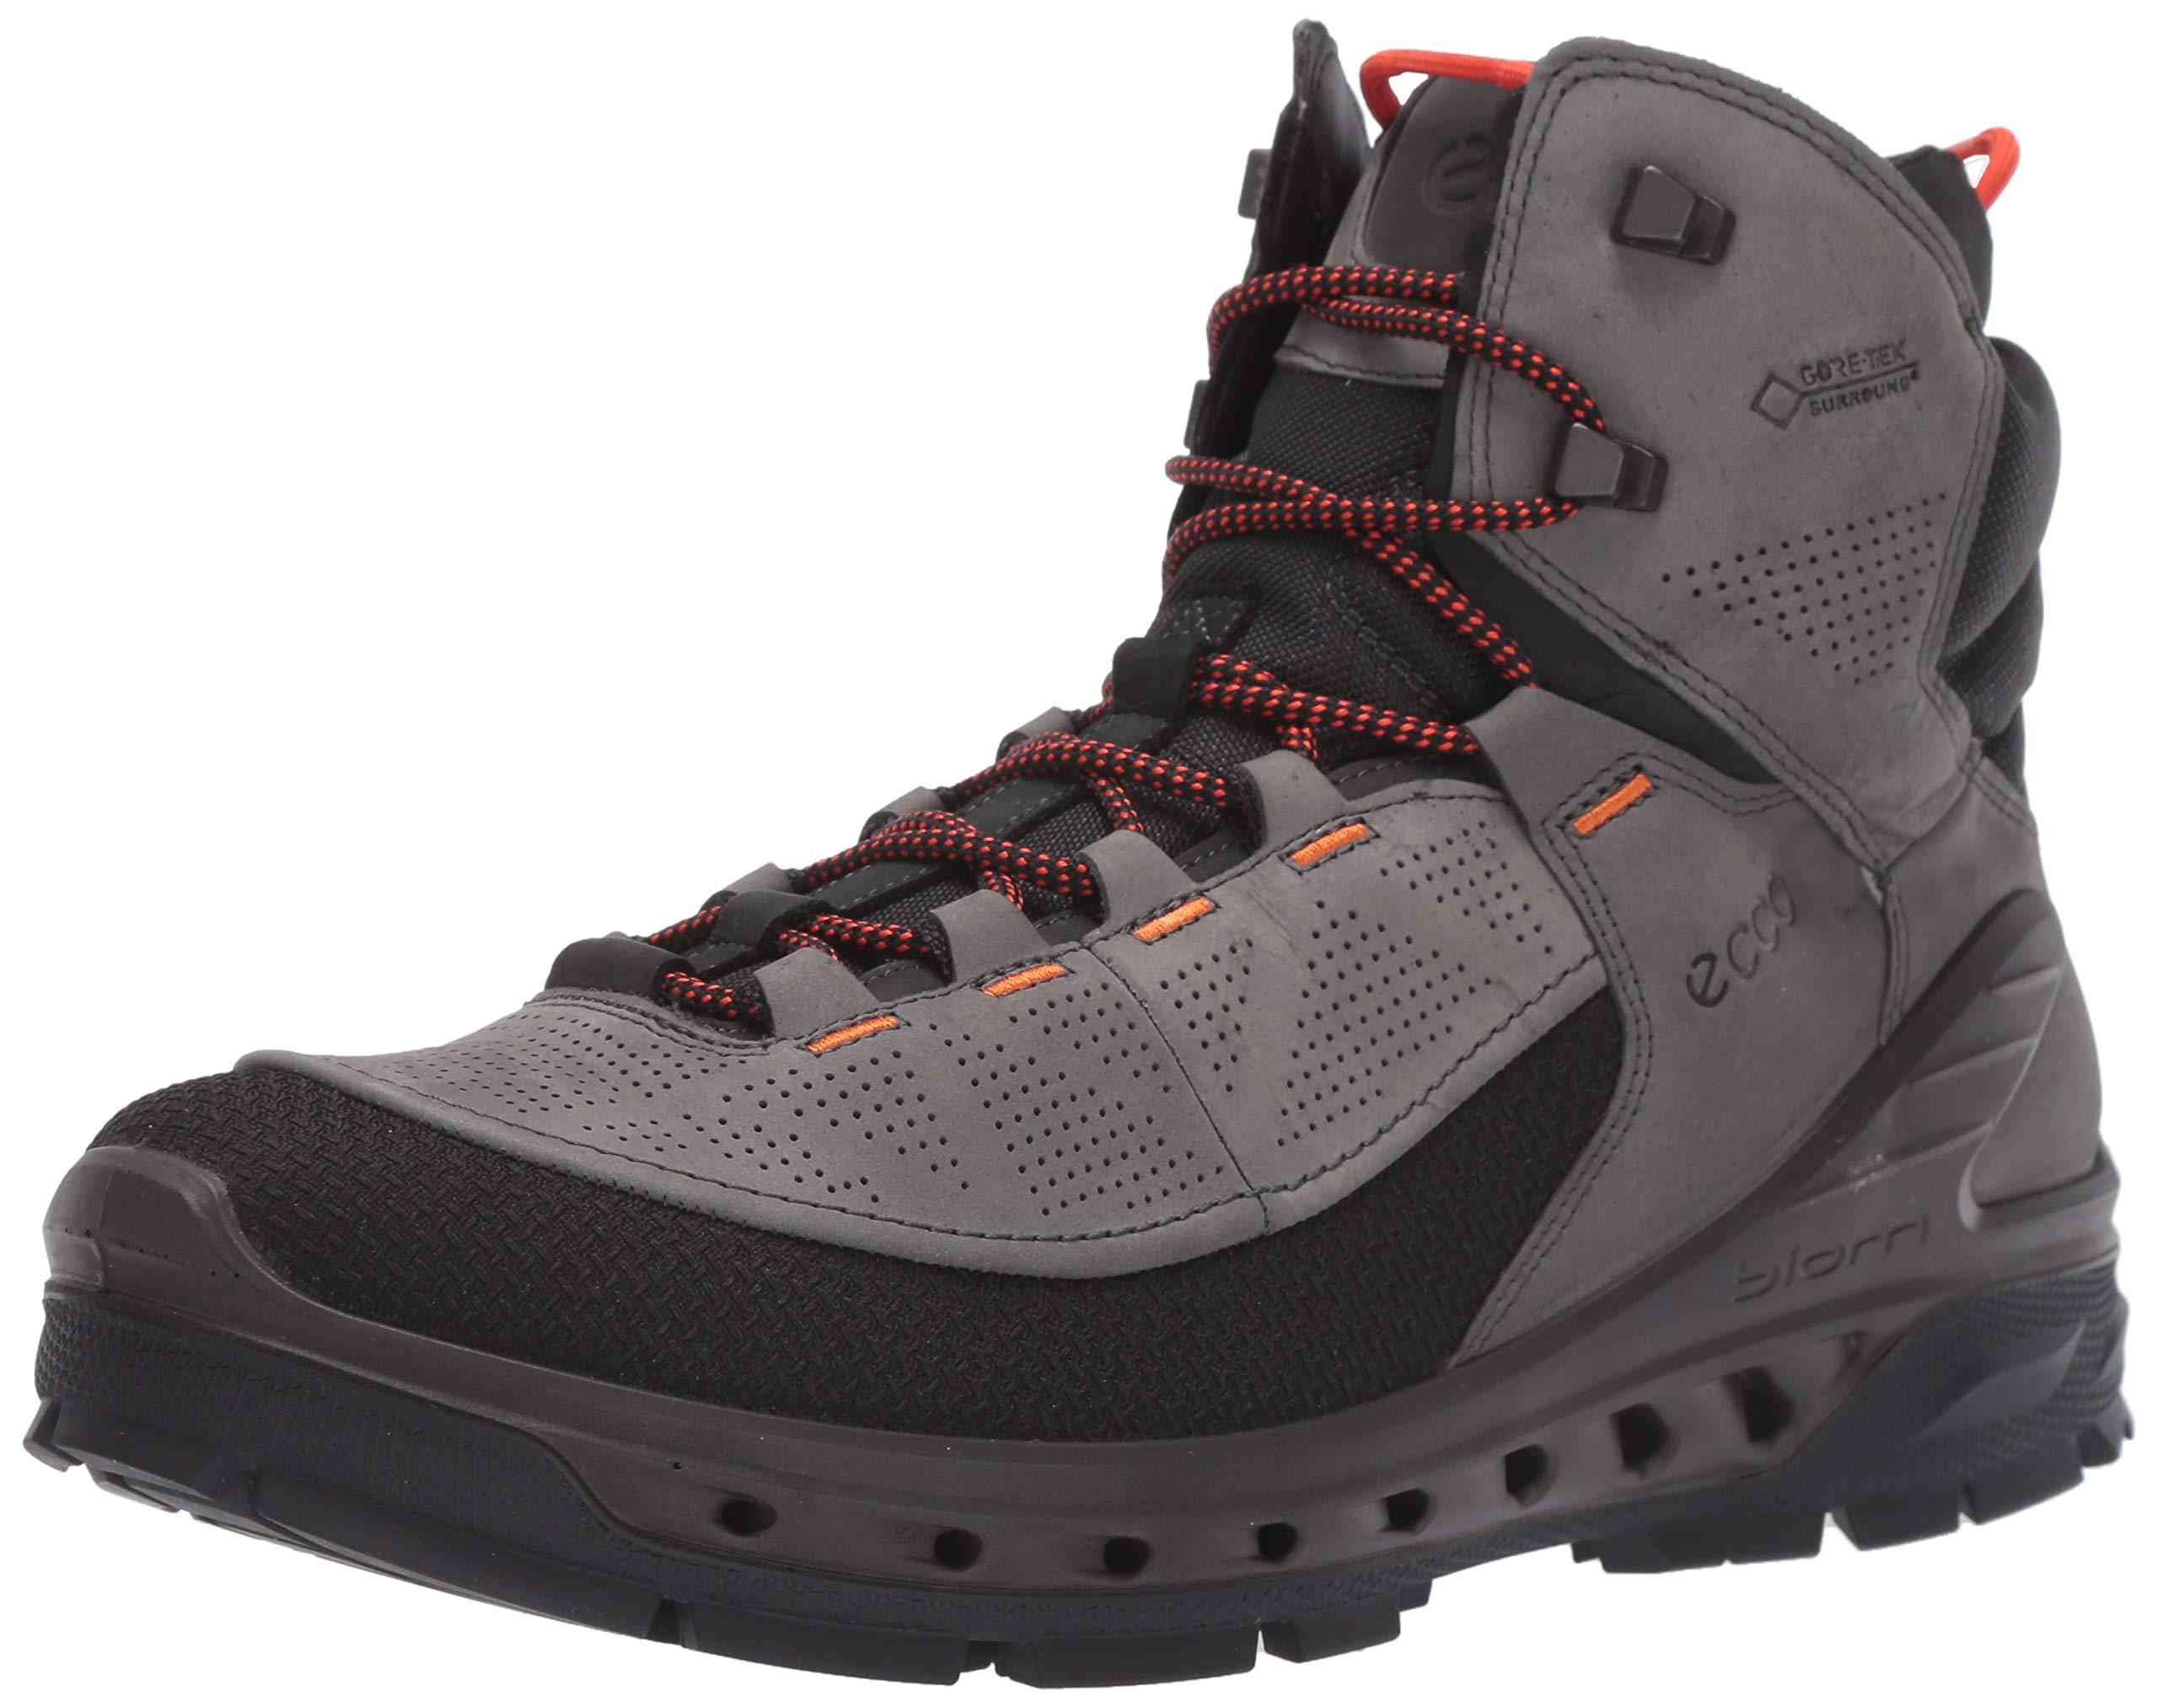 ECCO Men's Biom Venture Tr Gore-tex Hiking Boot, Black/Dark Shadow/Yak Nubuck, 41 M EU (7-7.5 US) by ECCO